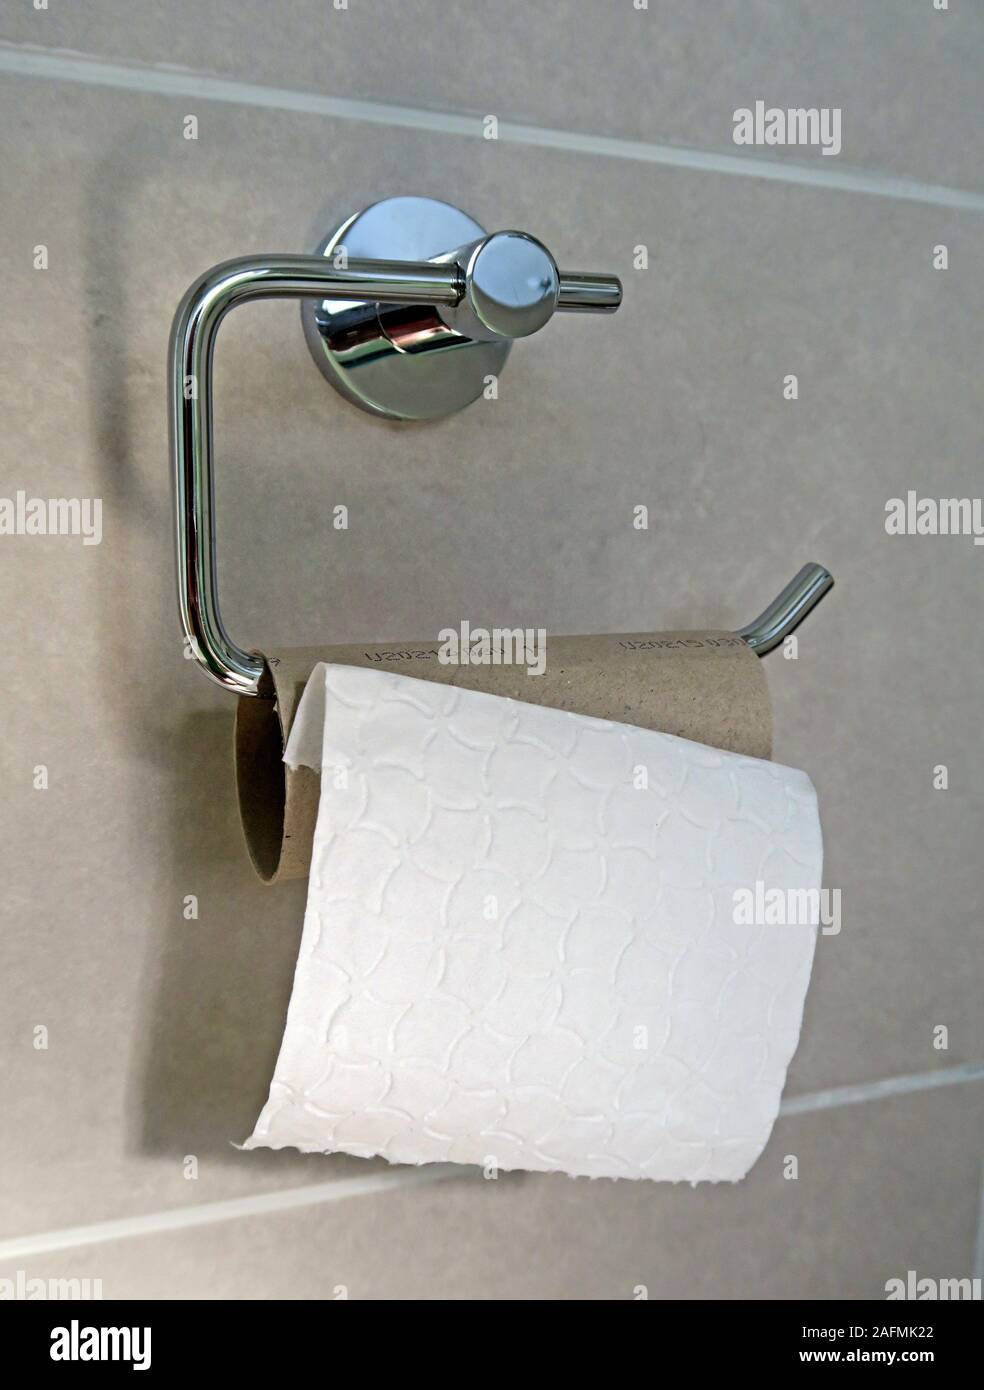 HotpixUK,@HotpixUK,GoTonySmith,England,UK,bog roll end,end of the toilet roll,the end of the toilet roll,toilet roll,bog roll,tube,finishing the roll,not replacing,empty tube,toilet paper,toilet,bathroom,restroom,tiles,tile,last sheet,sheet,sheets,last sheet on the roll,remaining sheet,toilet roll holder,bog standard,cruel,unfair,selfish,toilet habit,toilet habits,jeopardy,hopeless,hopelessness,IBS,Irritable Bowel Syndrome,bowel,movement,poo